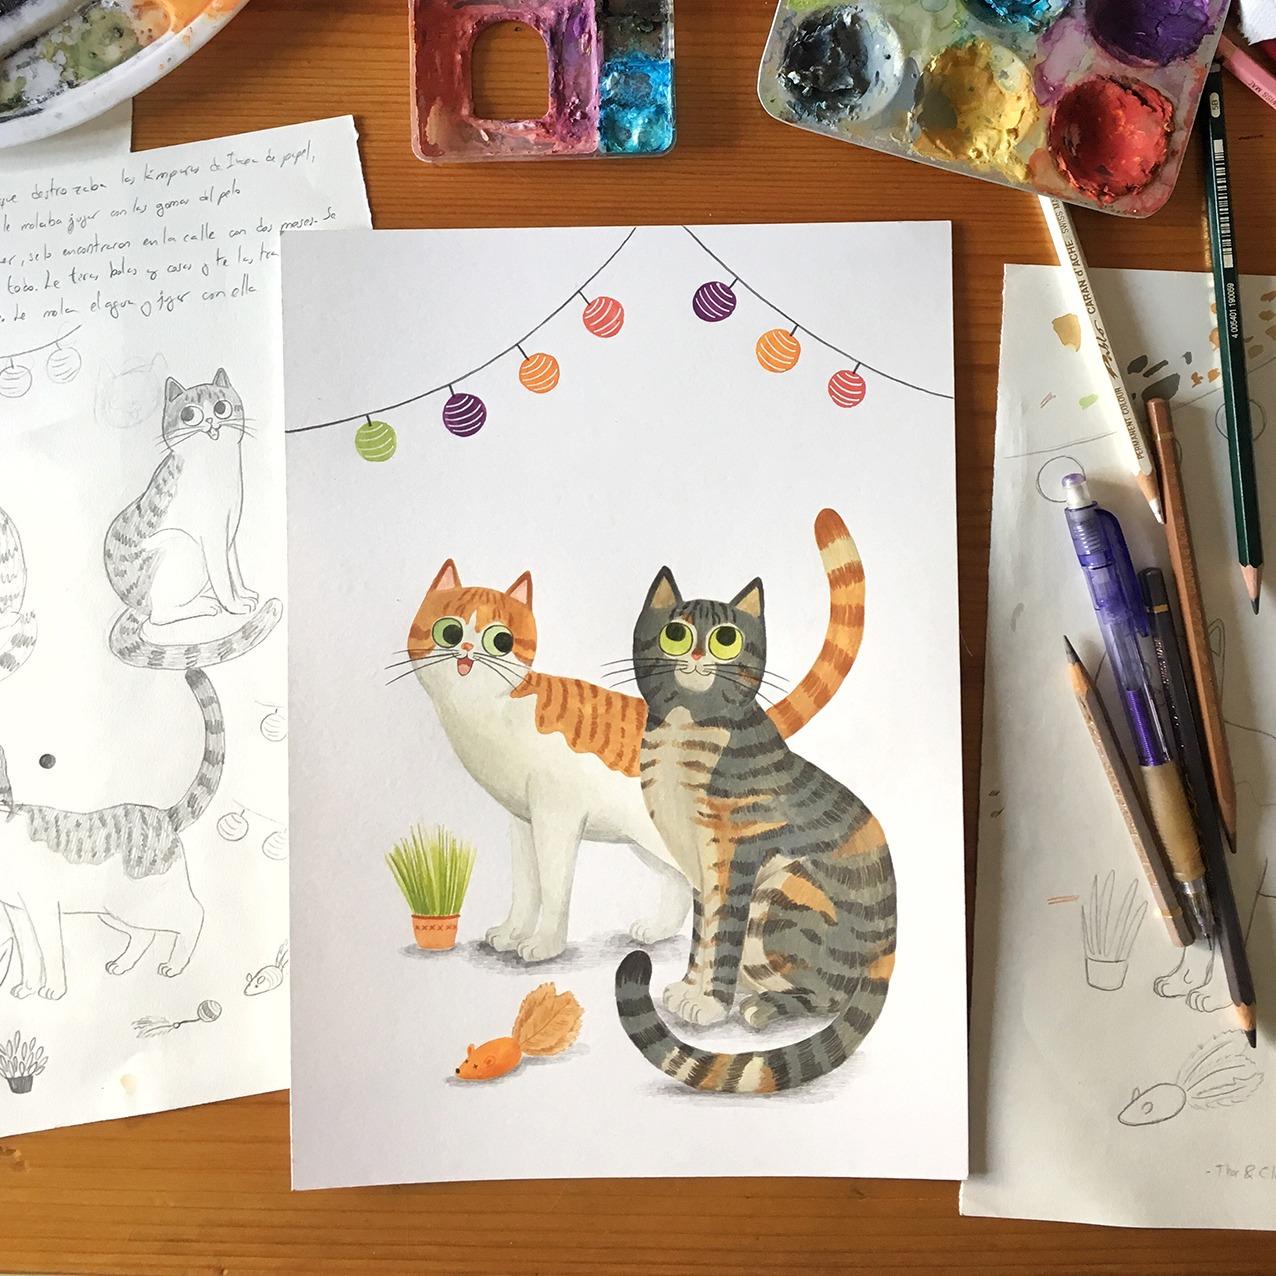 ilustracion de gatos, dibujo de gatos, ilustracion infantil de gatos, retrato de gato personalizado, retrato de mascota personalizado, Mar Villar, retratos de gatos, ilustracion personalizada de gato, ilustración personalizada de mascota, regalar ilustración personalizada de gato, regalar ilustración personalizada de mascota, retratos personalizados de mascotas,